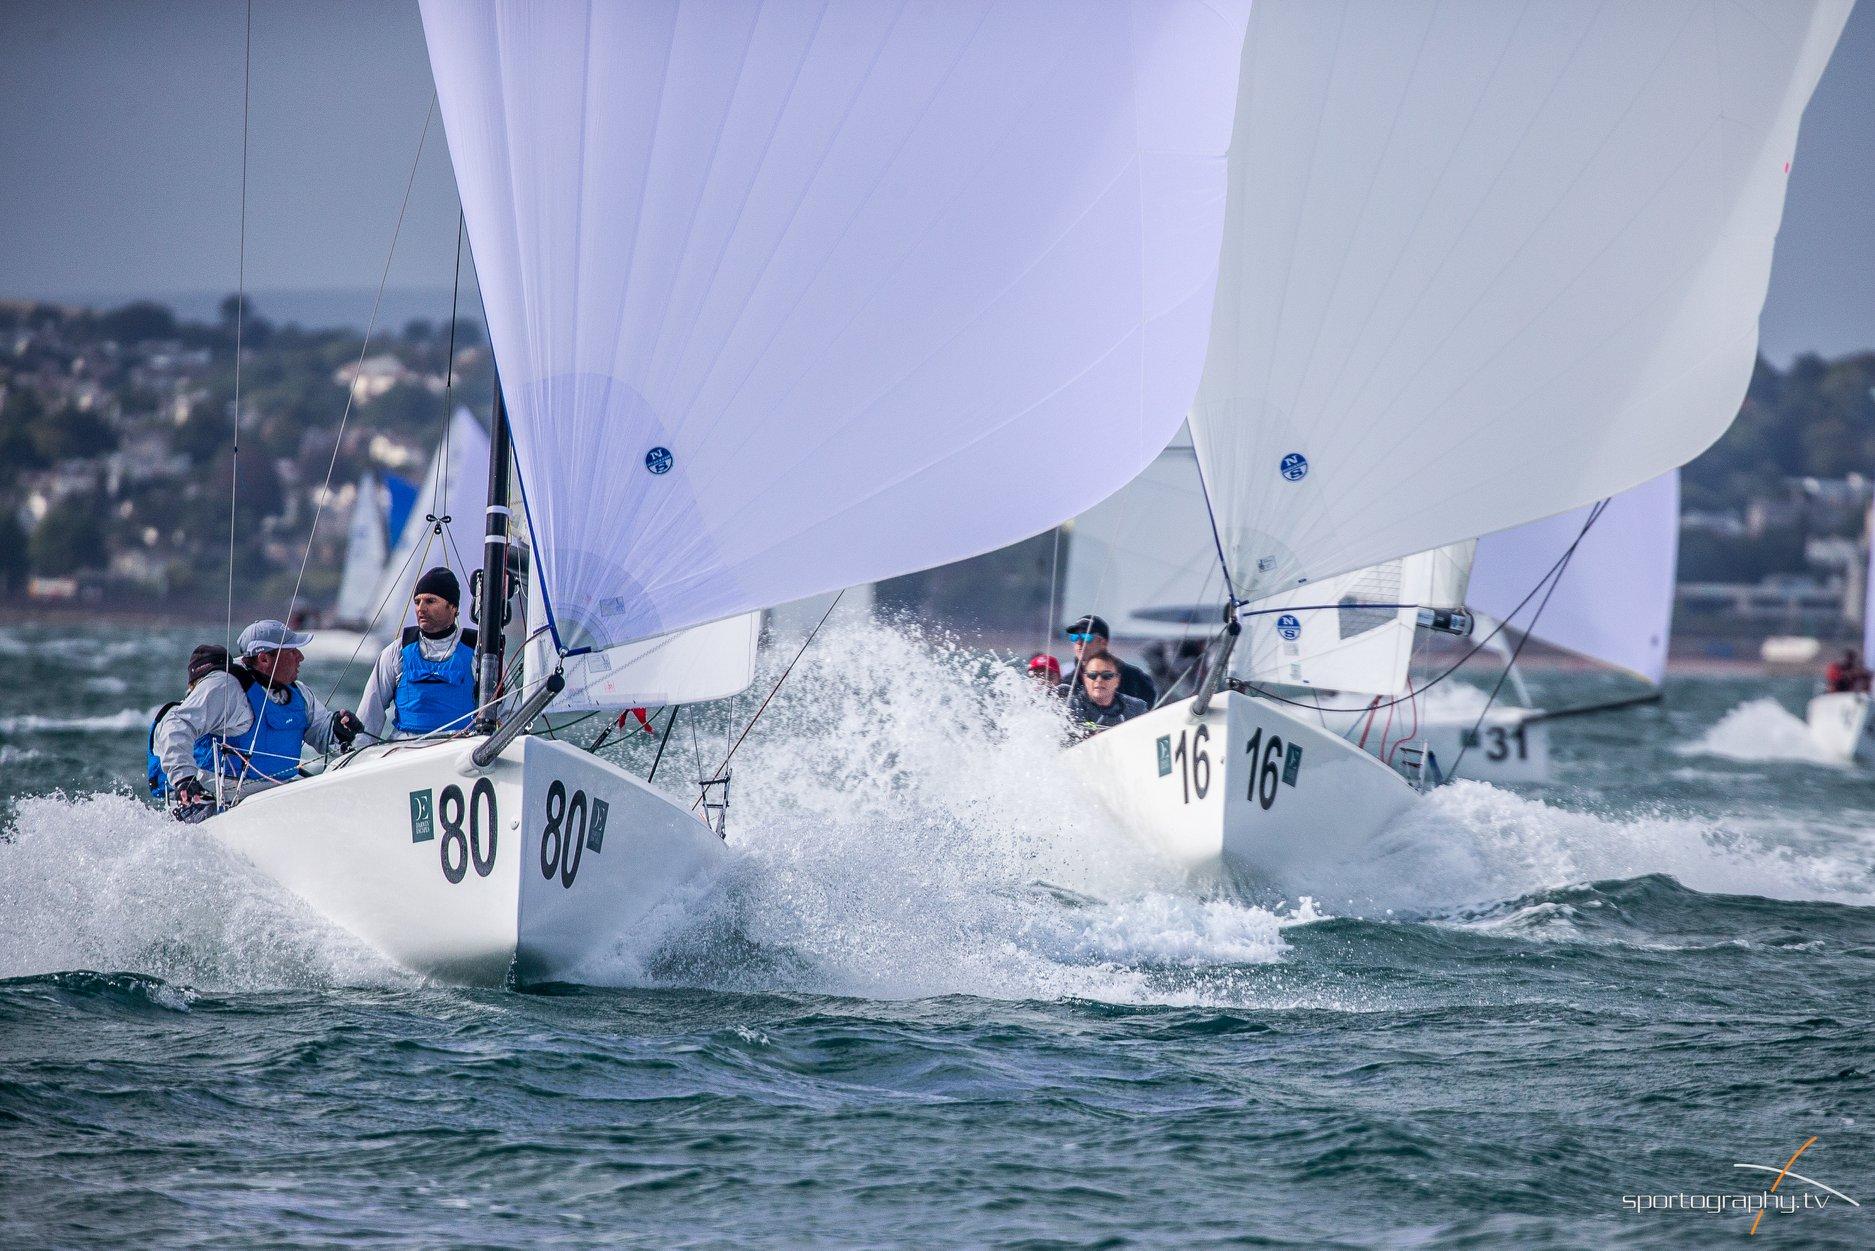 YCCS members at J/70 Worlds  - NEWS - Yacht Club Costa Smeralda